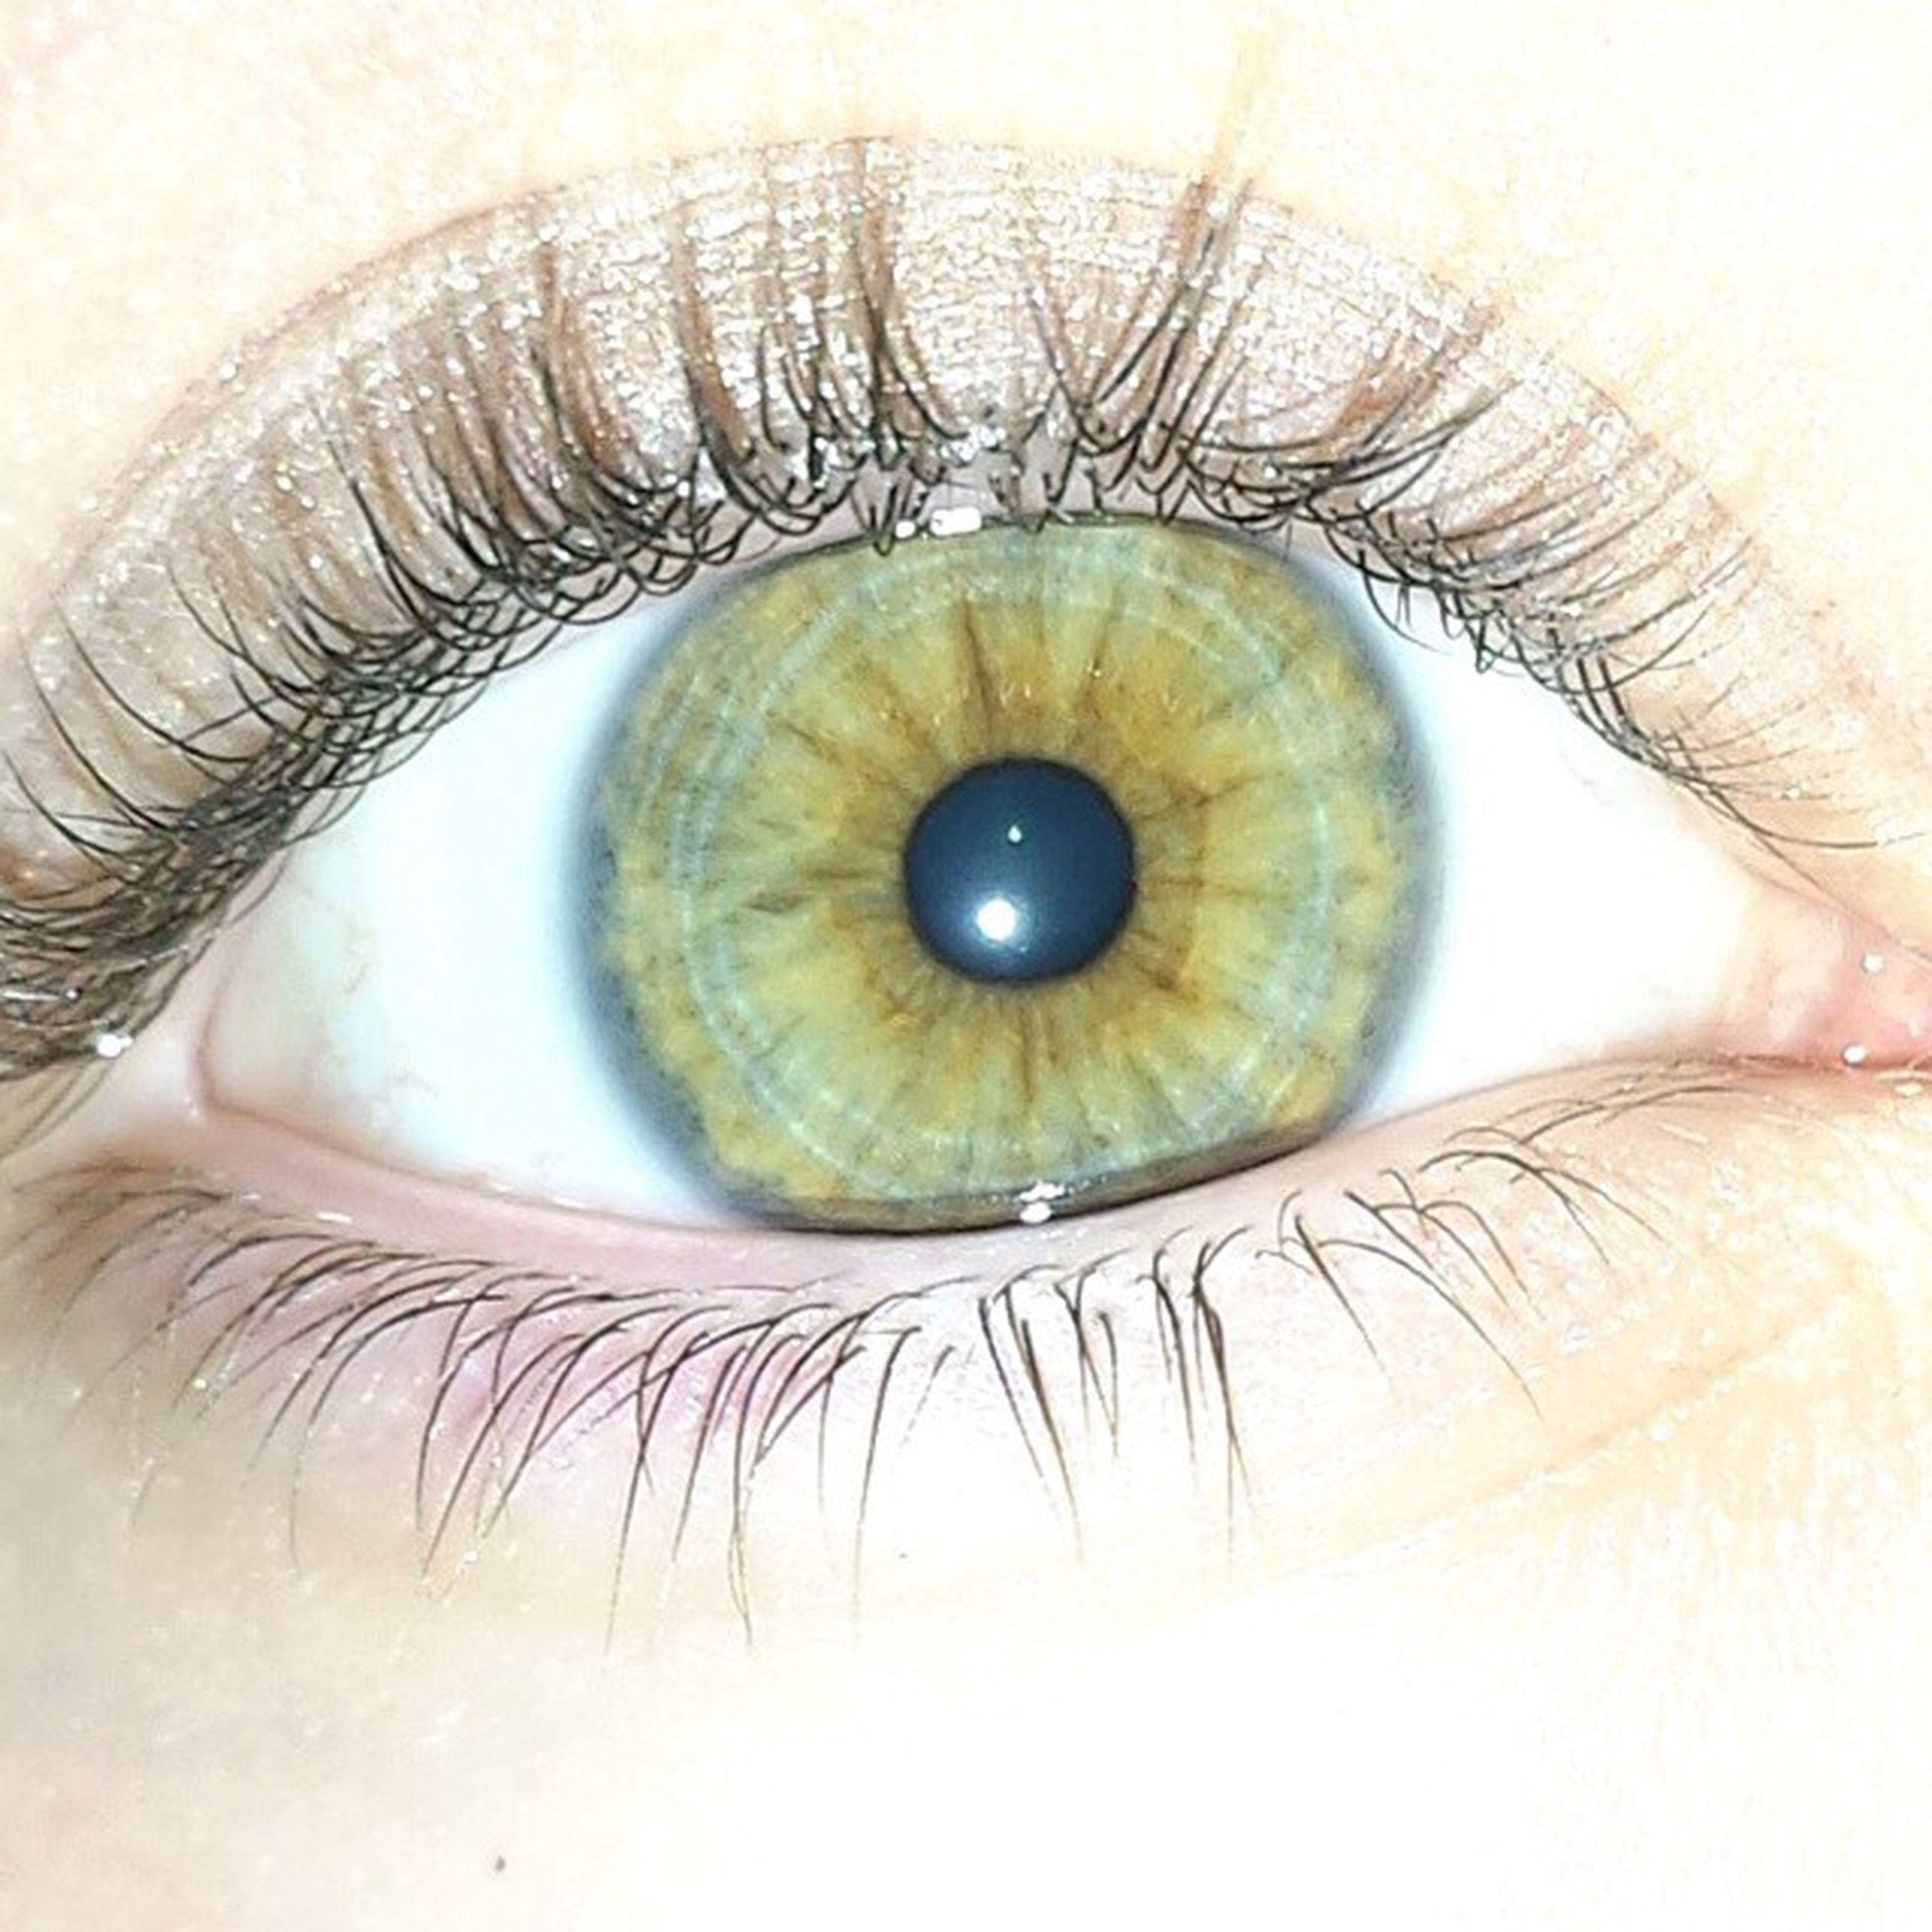 human eye, eyelash, eyesight, sensory perception, close-up, iris - eye, extreme close-up, looking at camera, eyeball, indoors, portrait, studio shot, part of, human skin, vision, unrecognizable person, white background